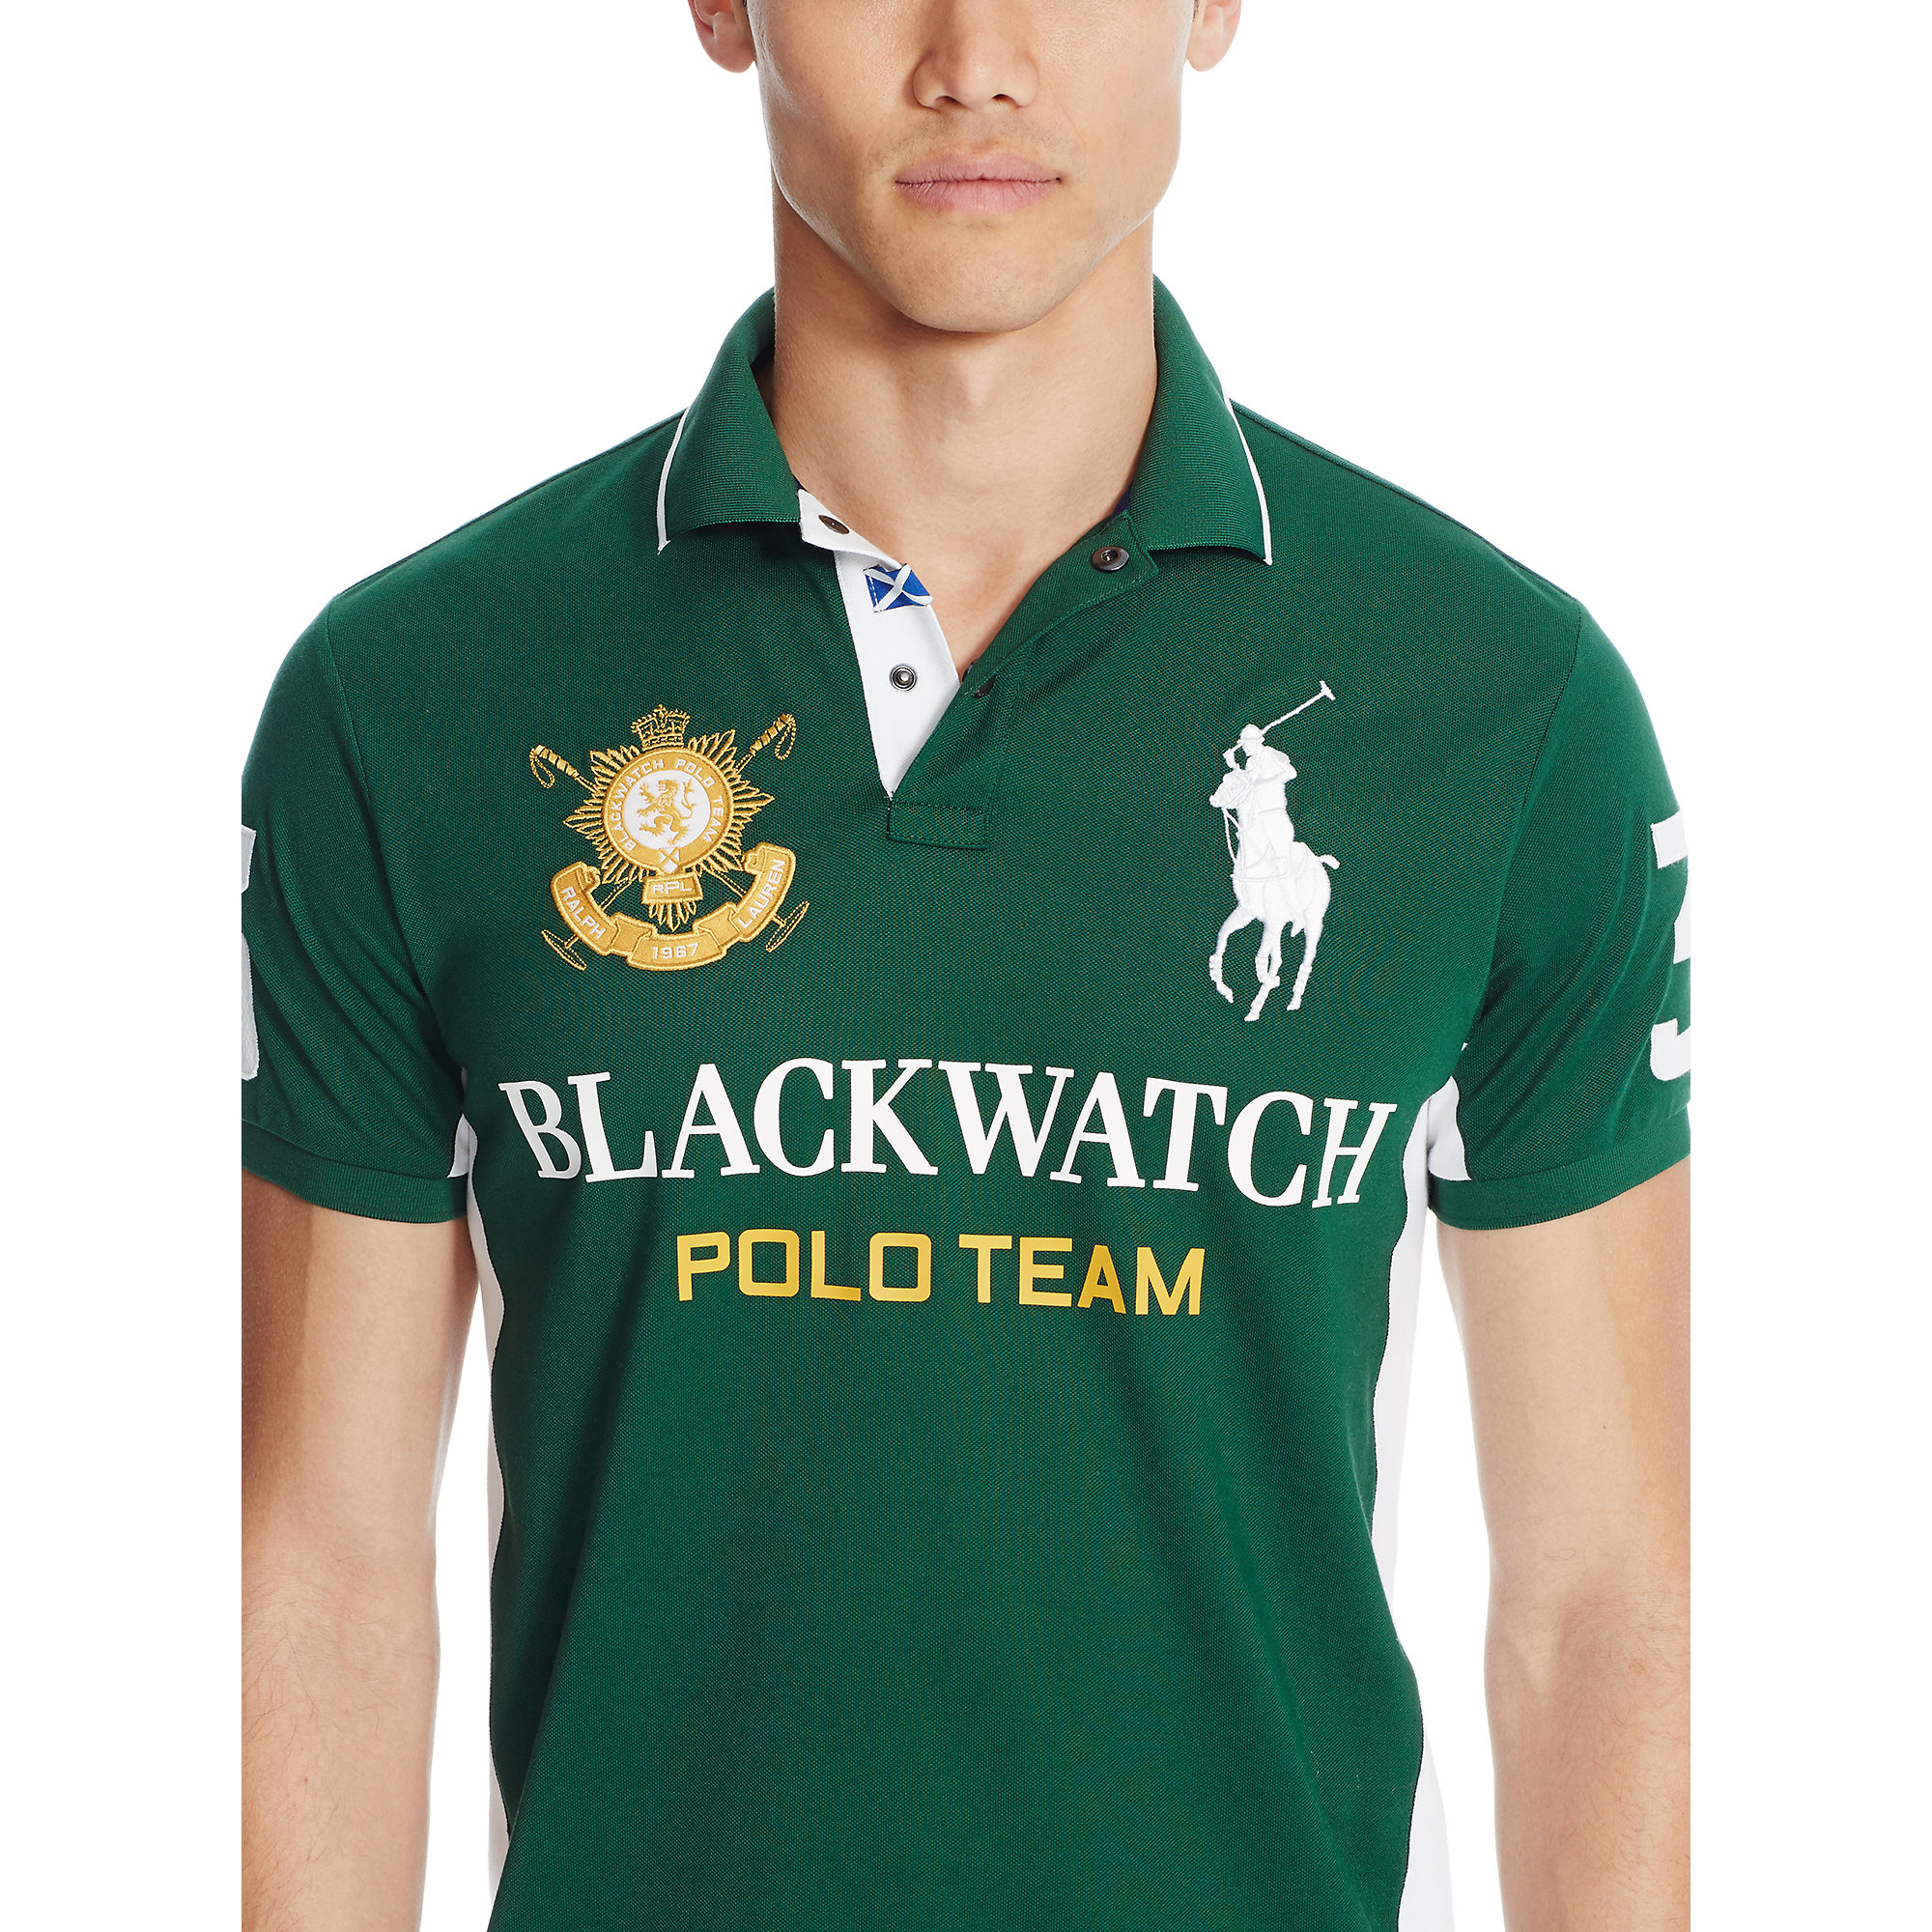 4f0efeec8286 Ralph Lauren Black Watch Polo Shirt   Chad Crowley Productions